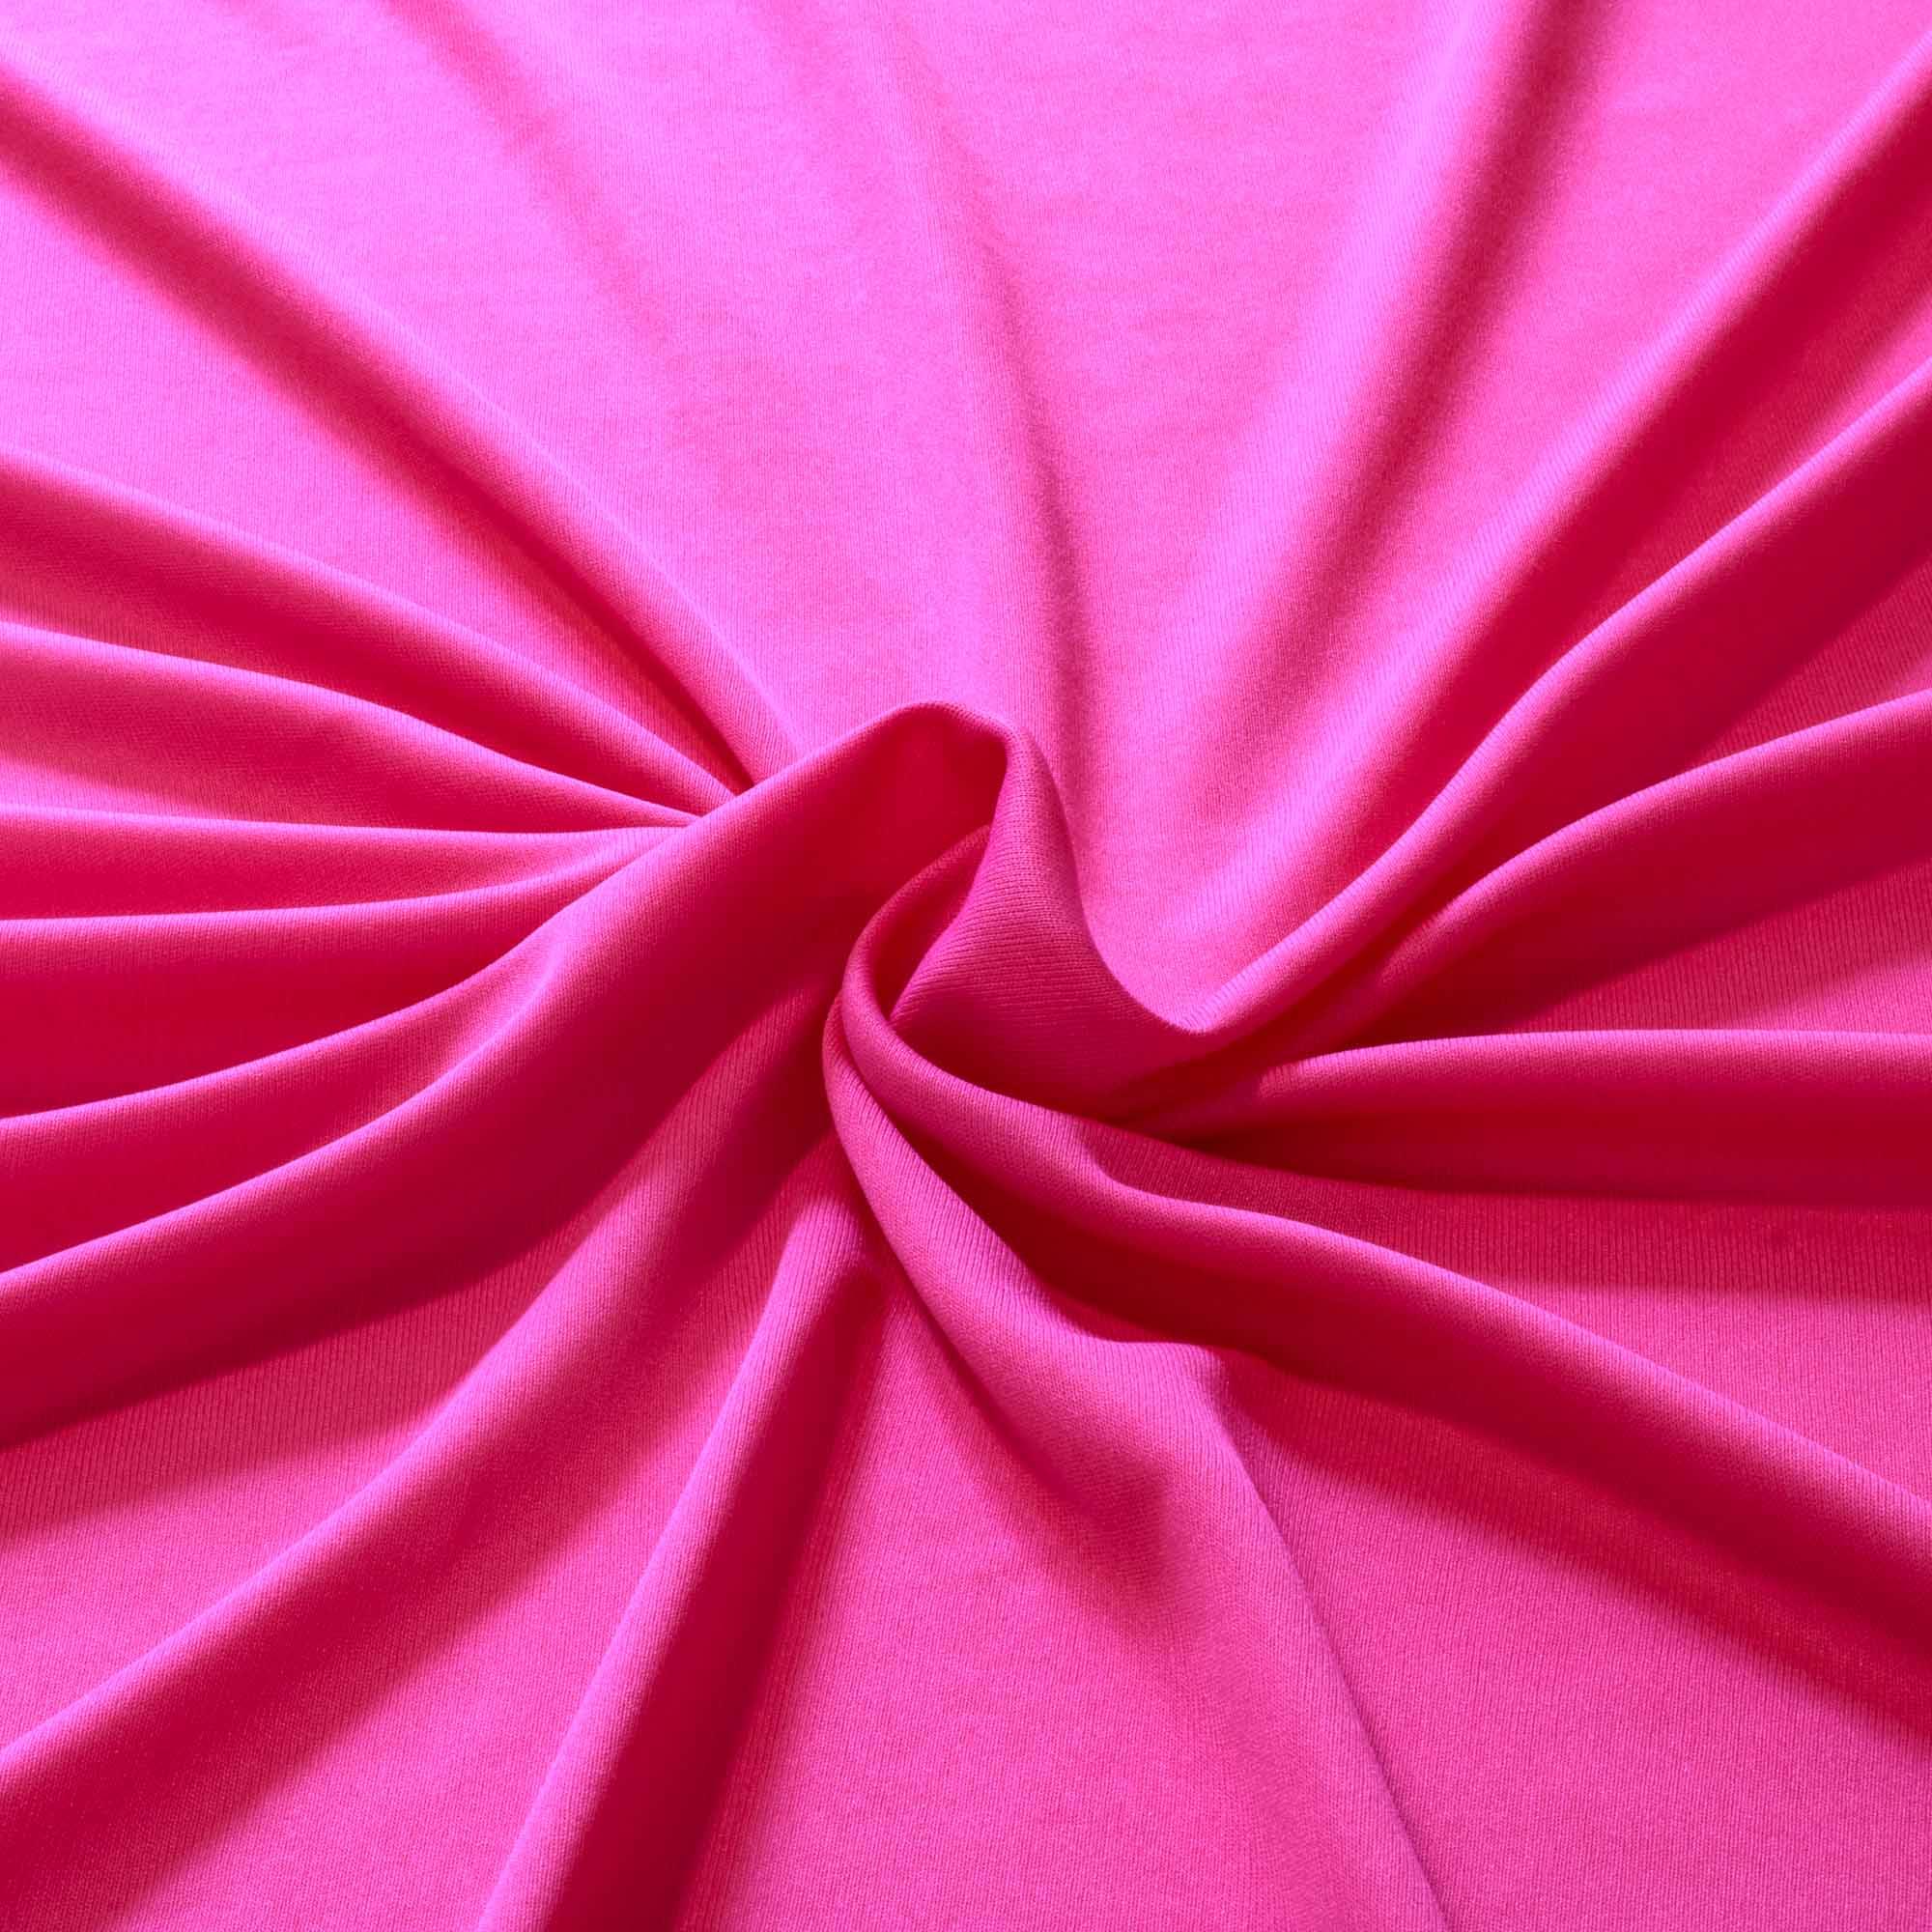 Tecido Malha Helanca Light Rosa Pink 100% Poliester 1,80 m Largura